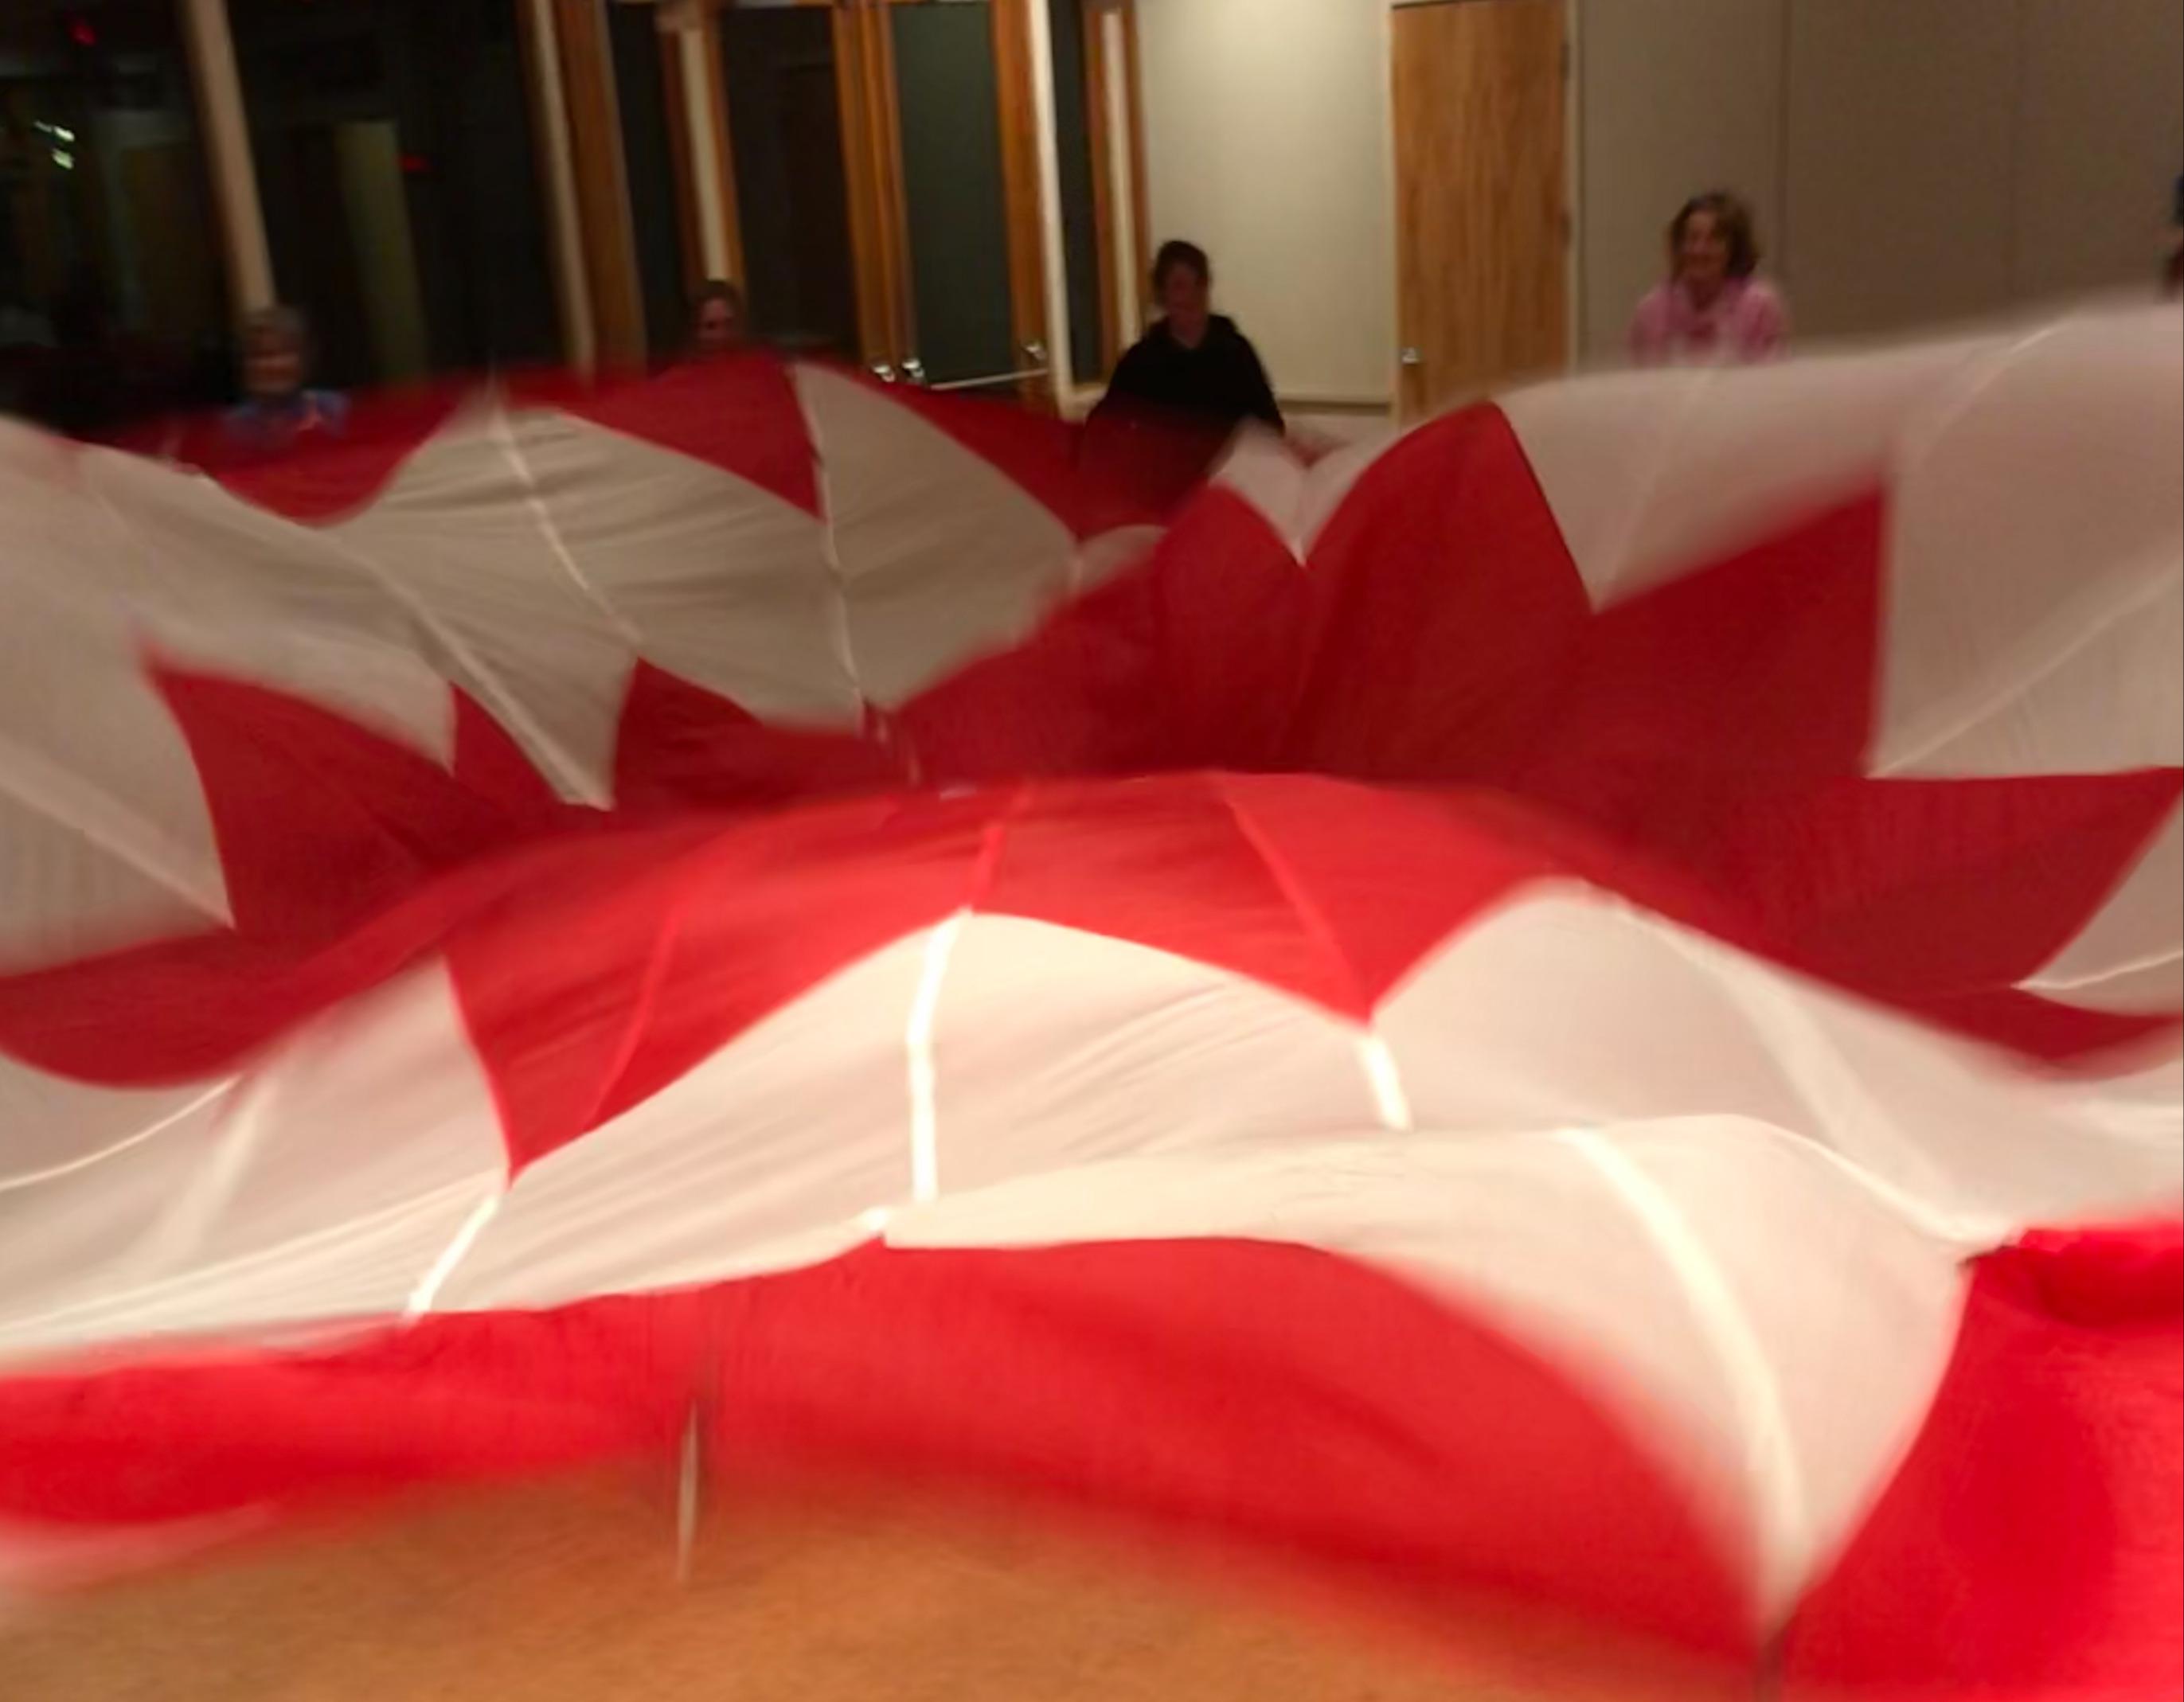 image of women shaking large parachute